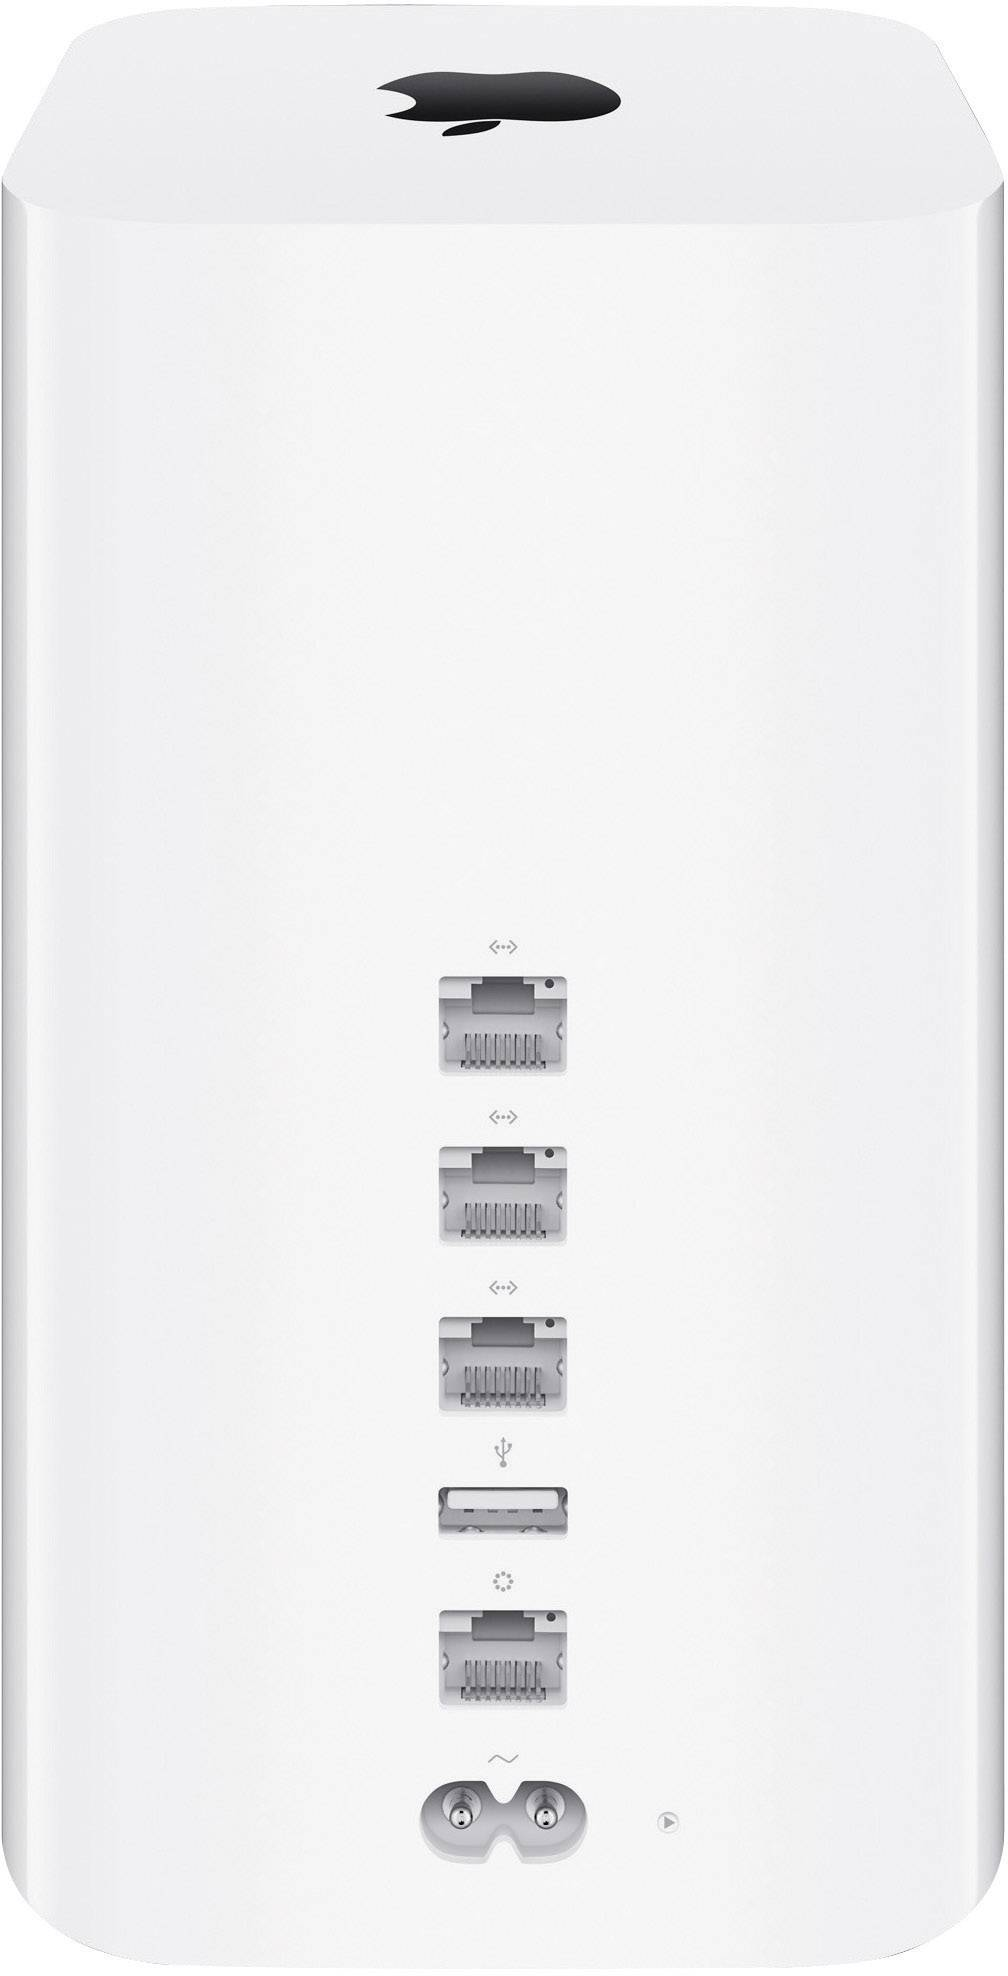 Apple Capsule Manual Diagram Of Honda Generator Parts Ex800 A Jpn Vin G100 Array Time 2tb Pdf U2022 Sfb Rh Southfloridabusinessnetwork Icu